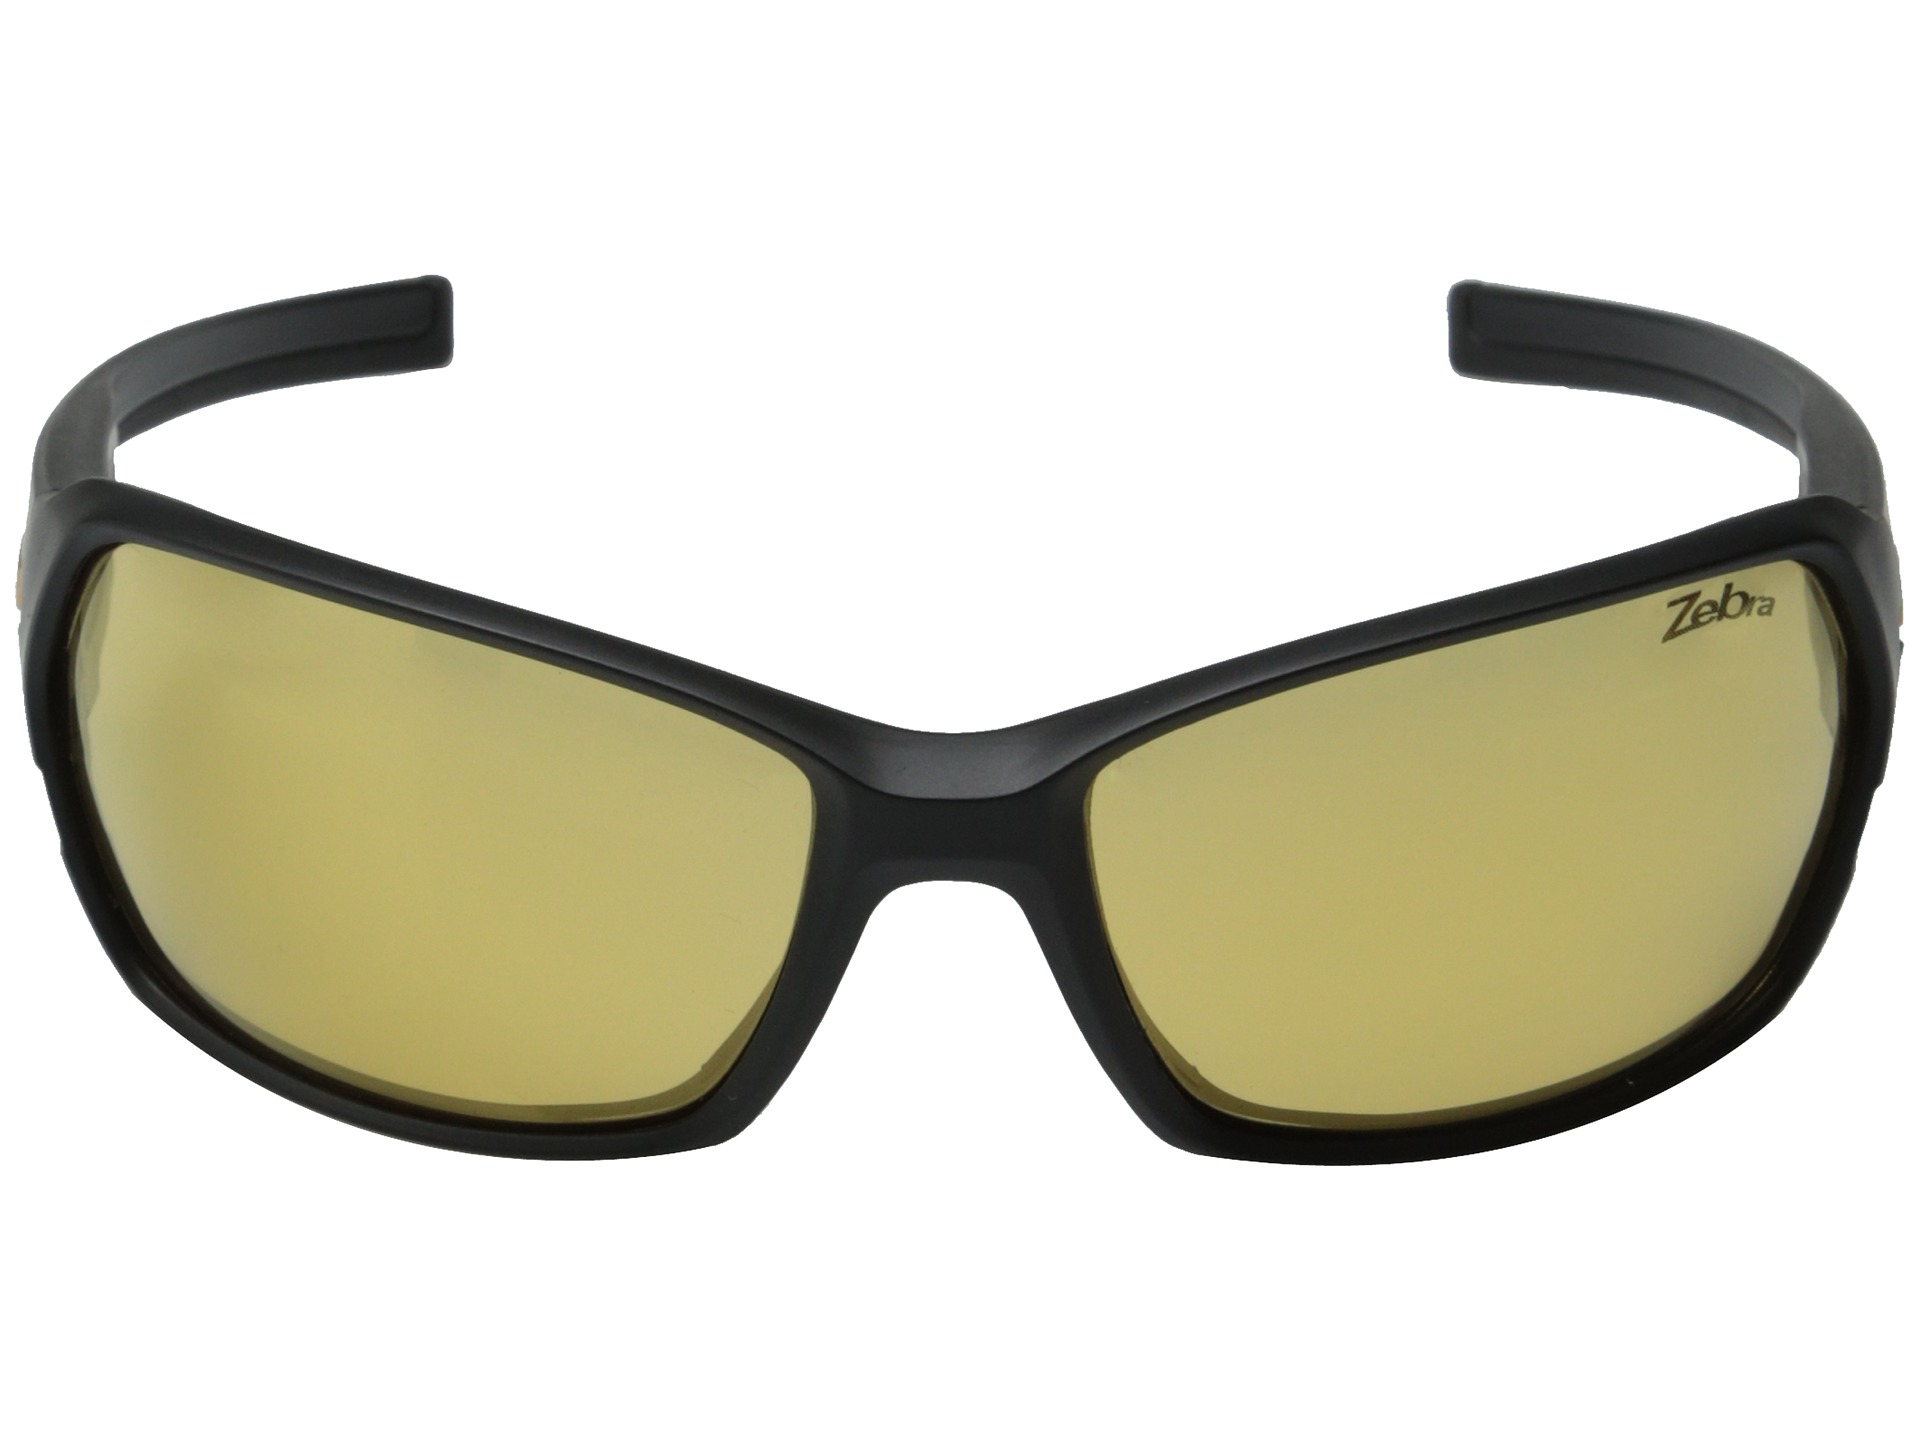 Performance Sunglasses  julbo eyewear dirt 2 0 performance sunglasses zappos com free